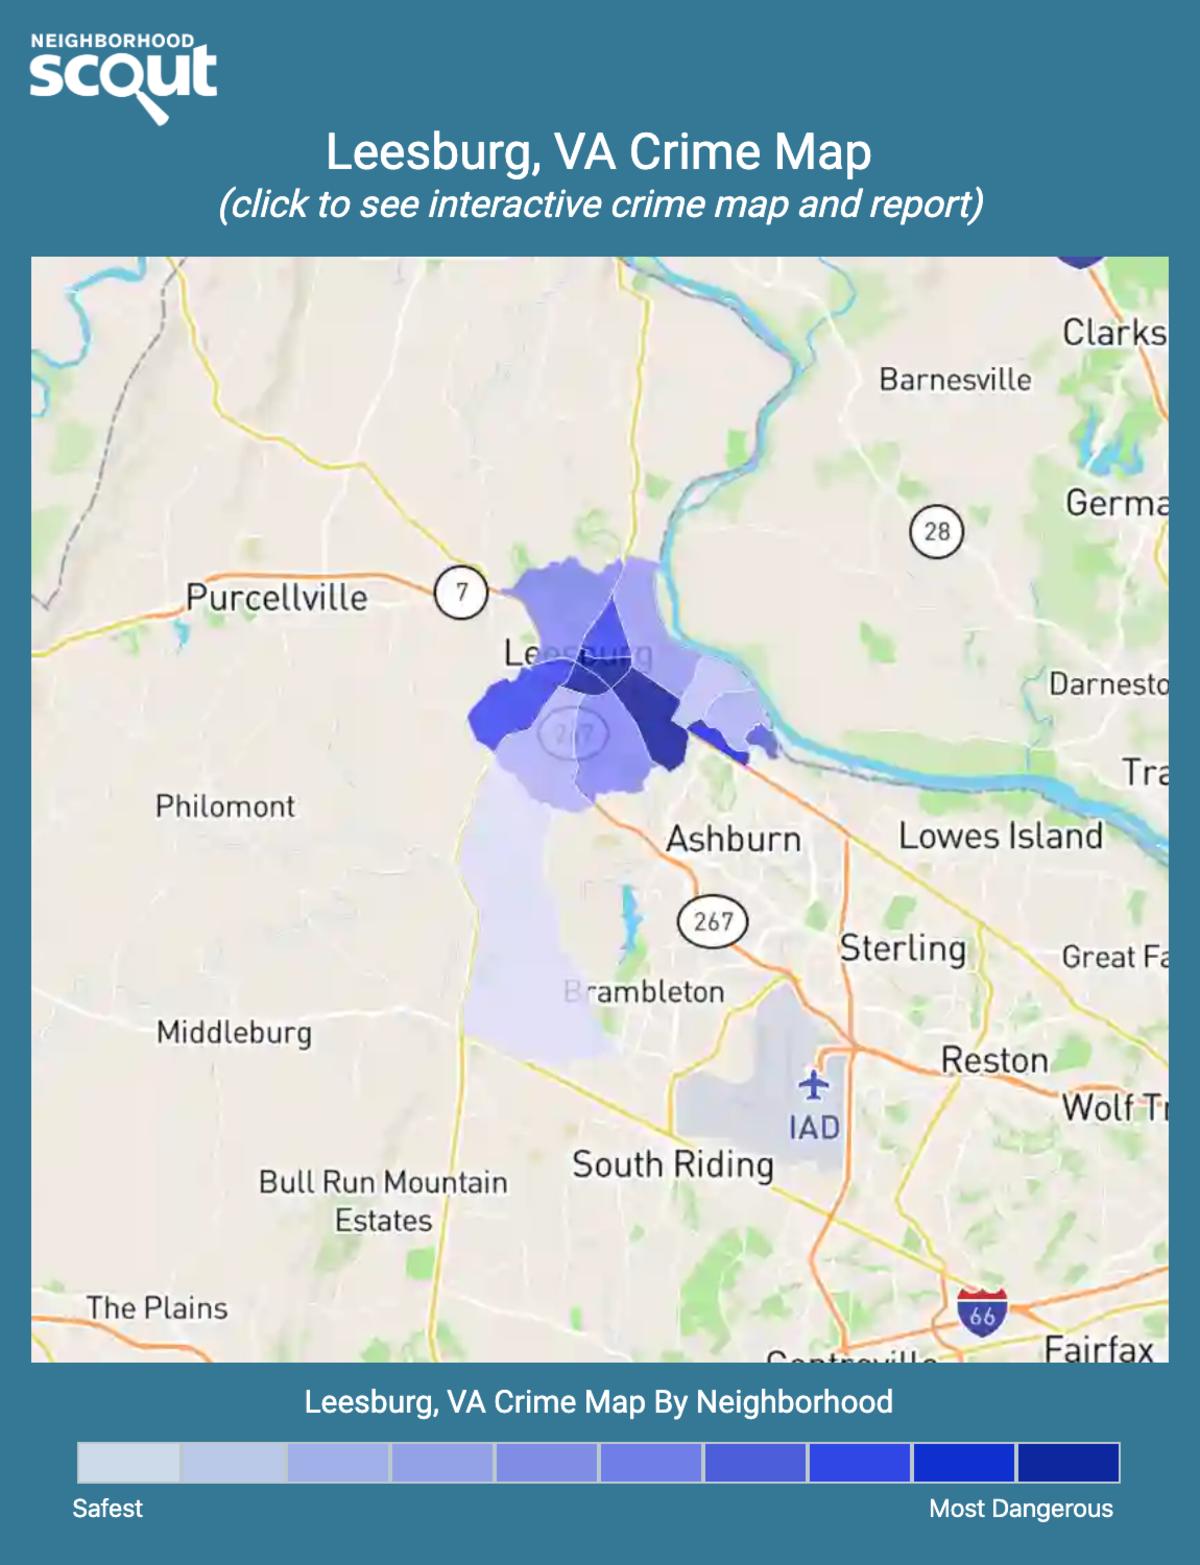 Leesburg, Virginia crime map